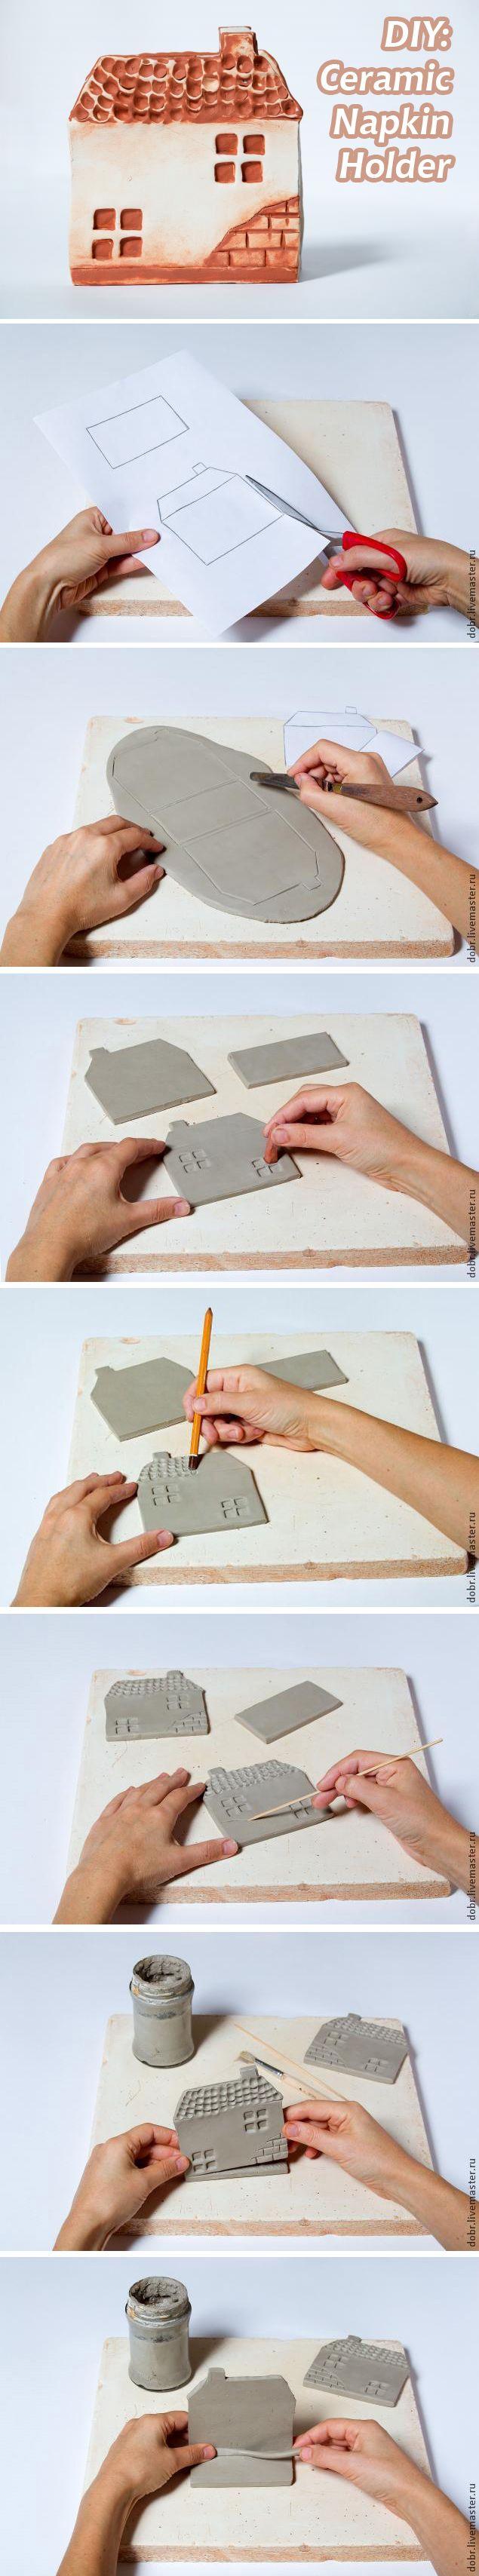 "DIY: Ceramic Napkin Holder. See more: http://www.livemaster.ru/topic/694303  Мастер-класс: Керамическая салфетница ""Старый домик""   #handmade #diy"